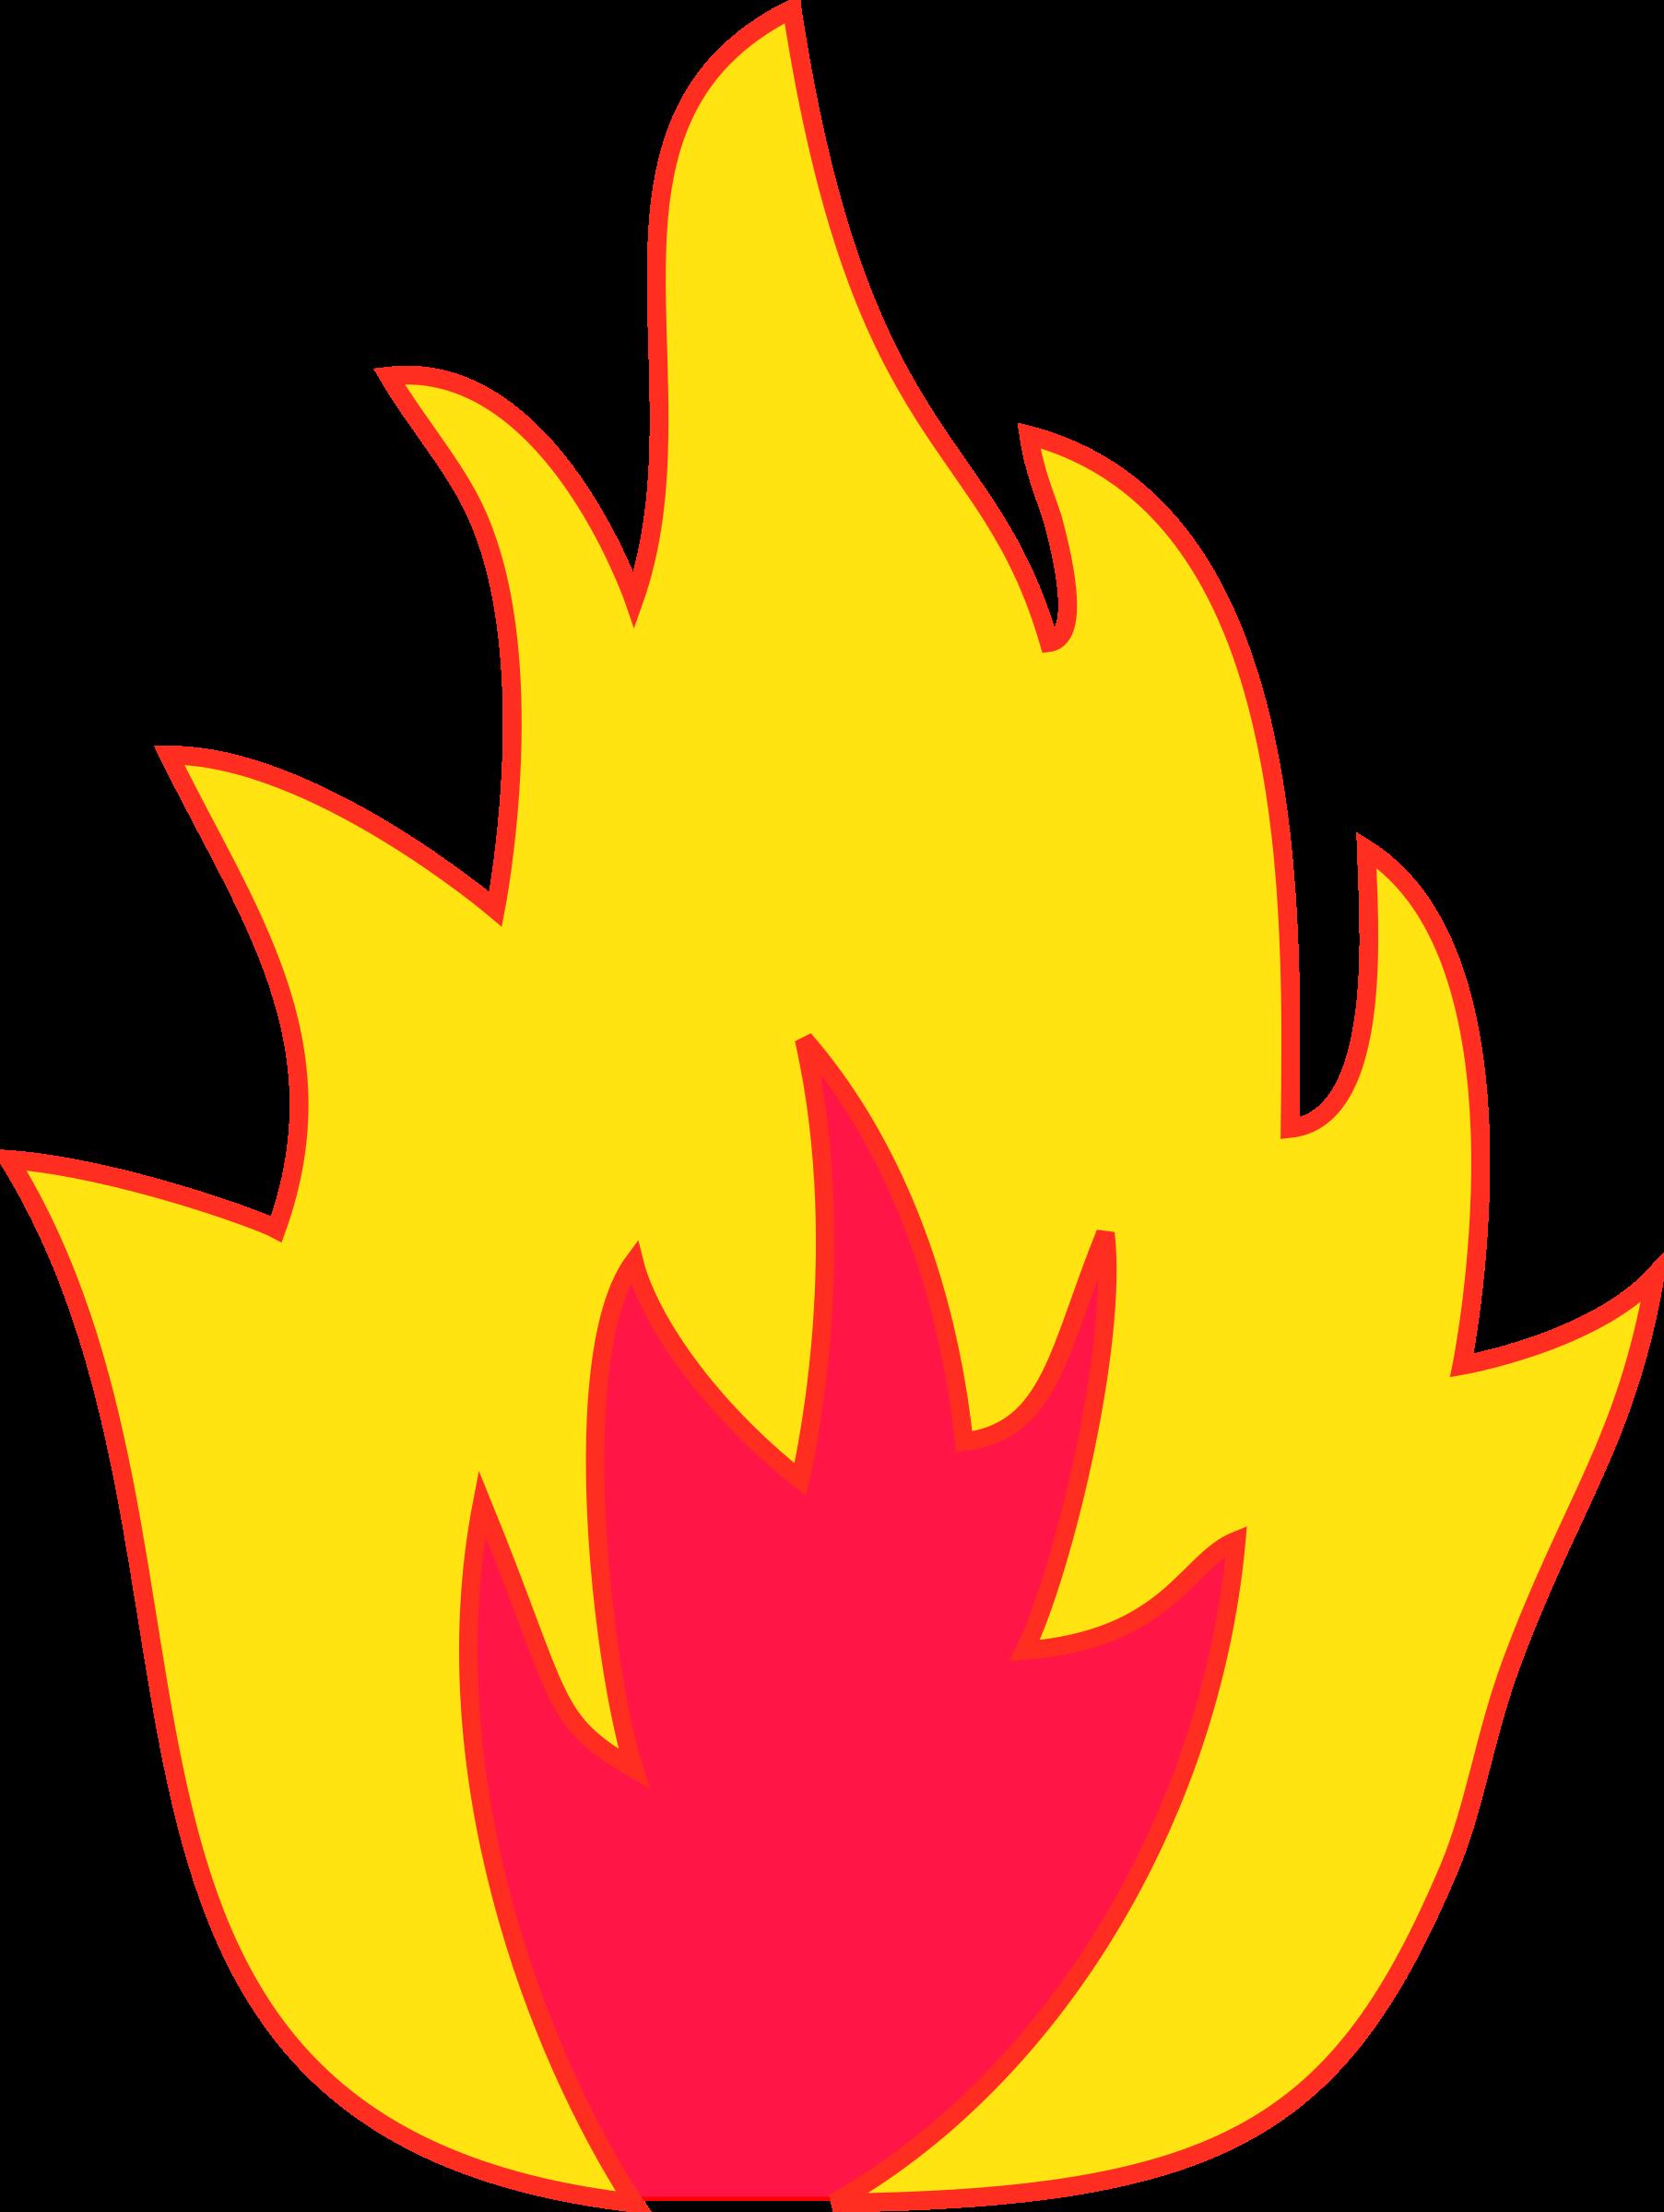 fire clipart pdf